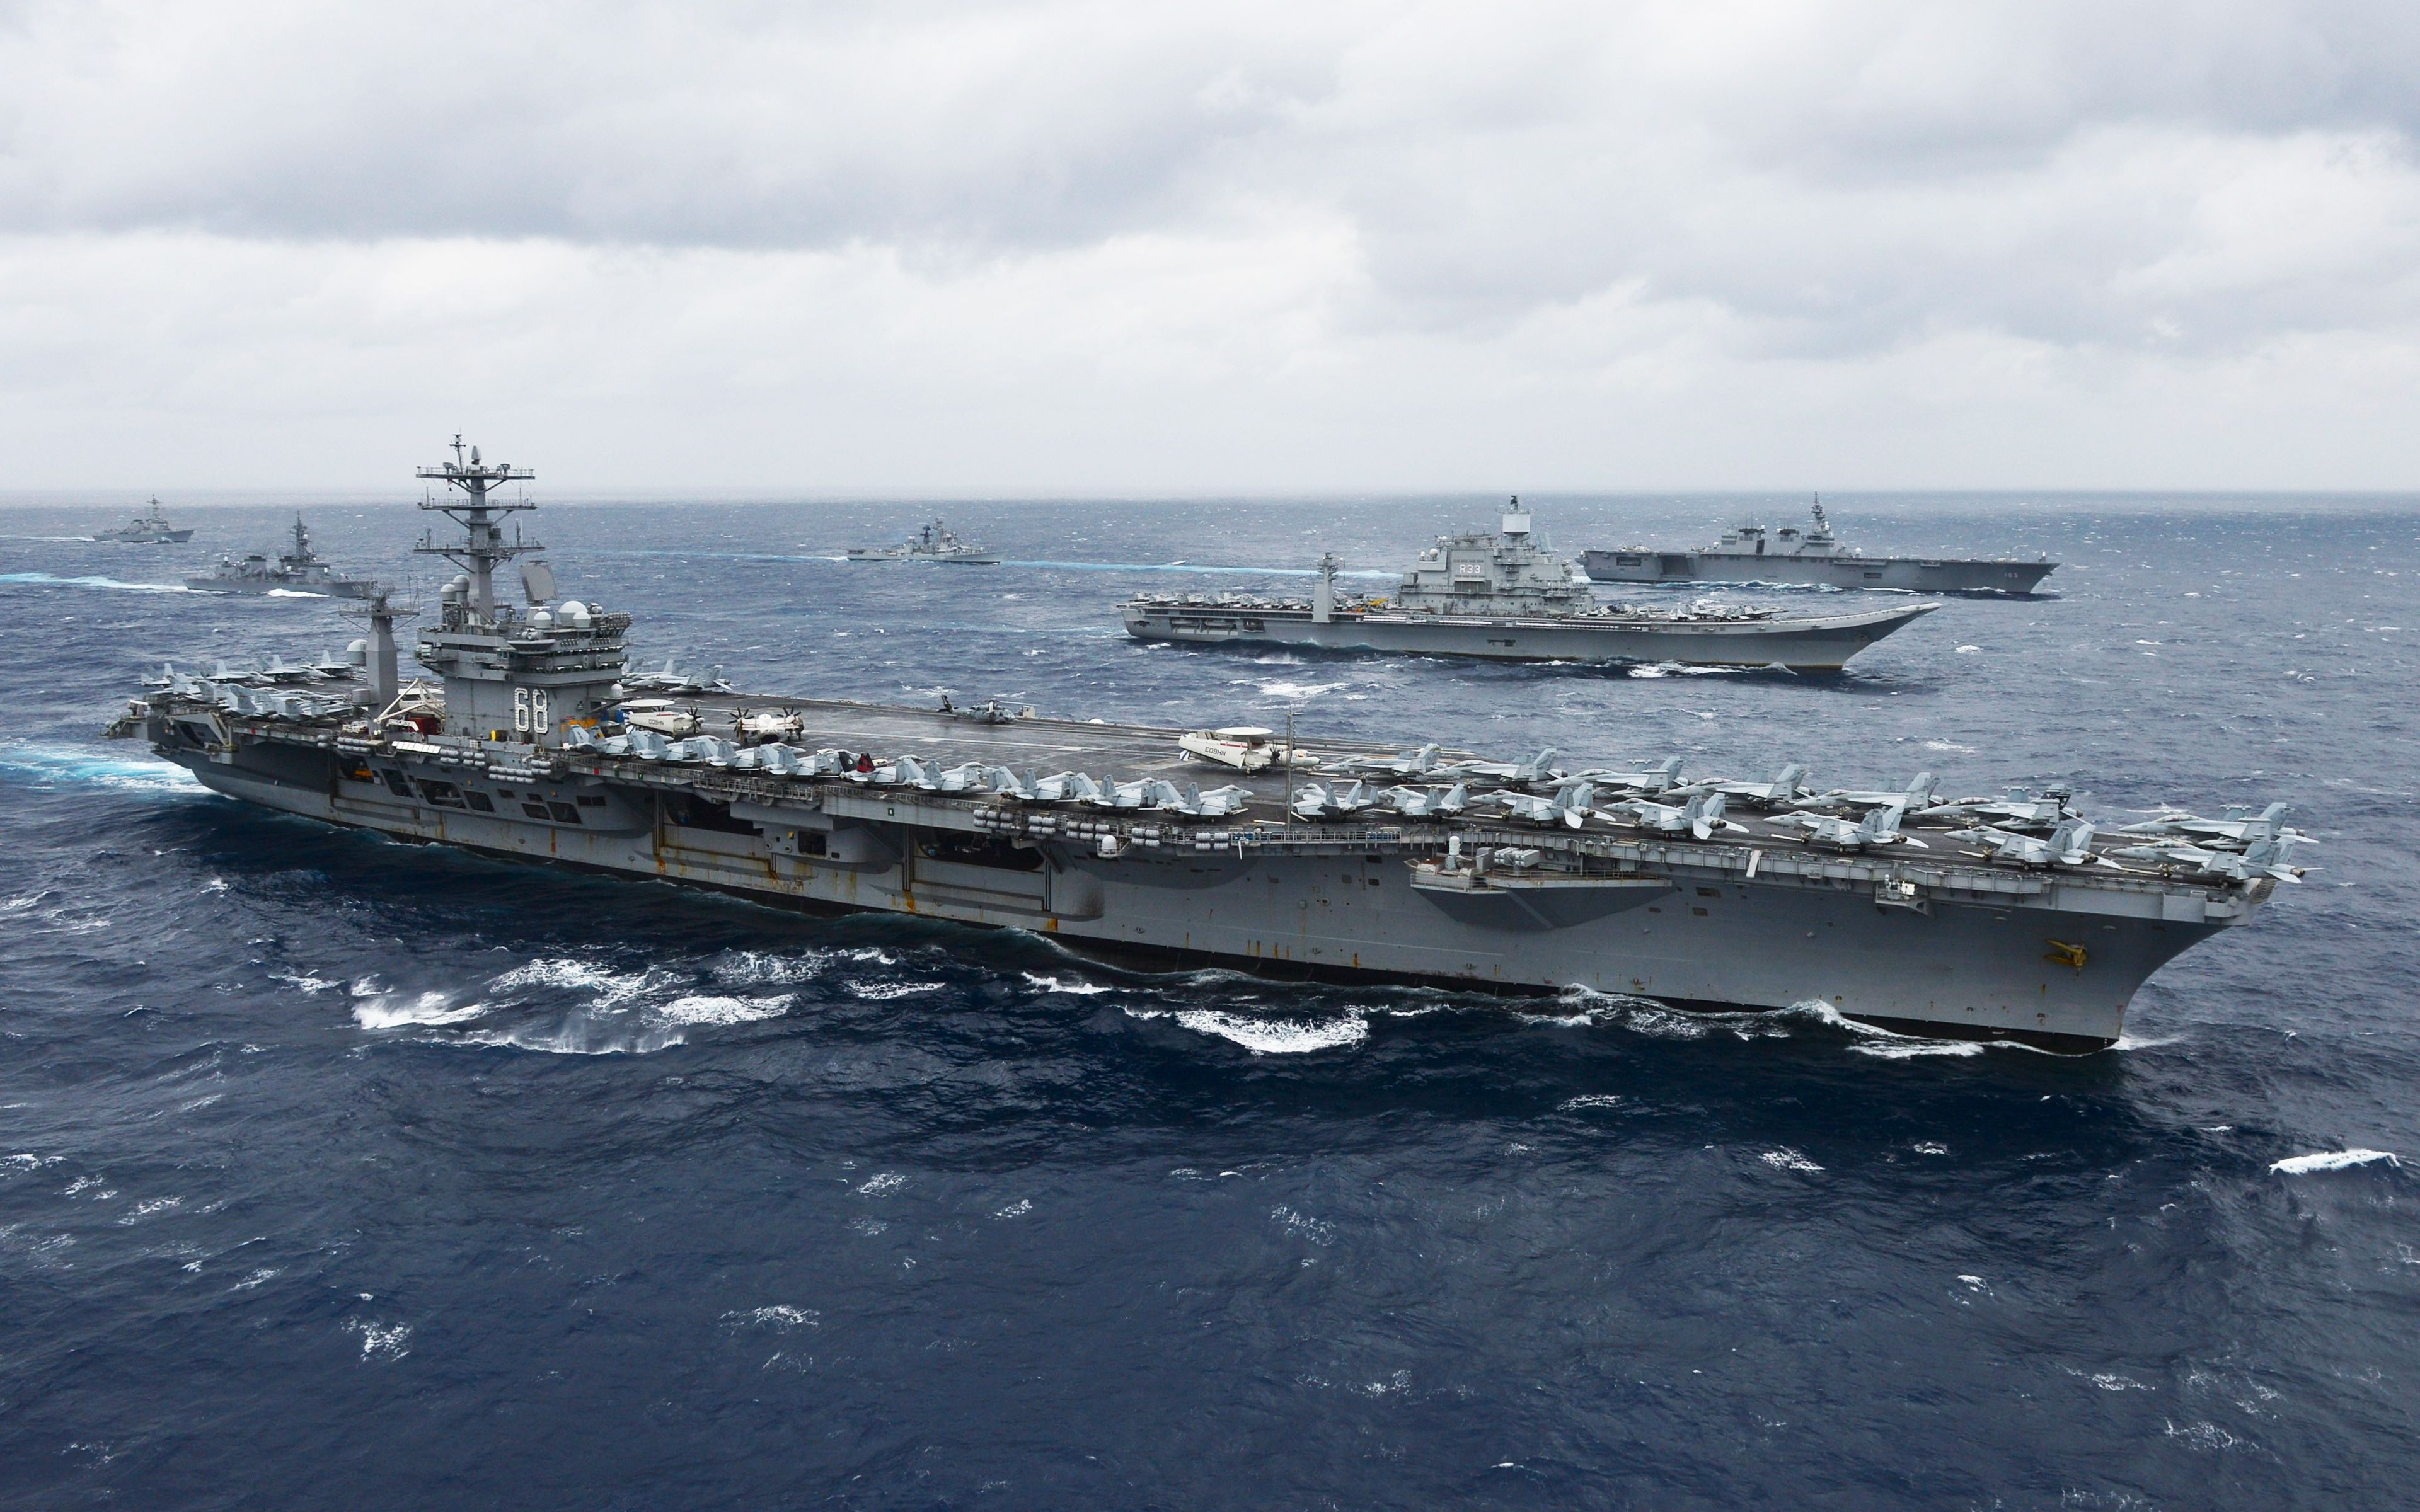 Uss Nimitz Cvn 68 American Aircraft Carrier Along With Ins